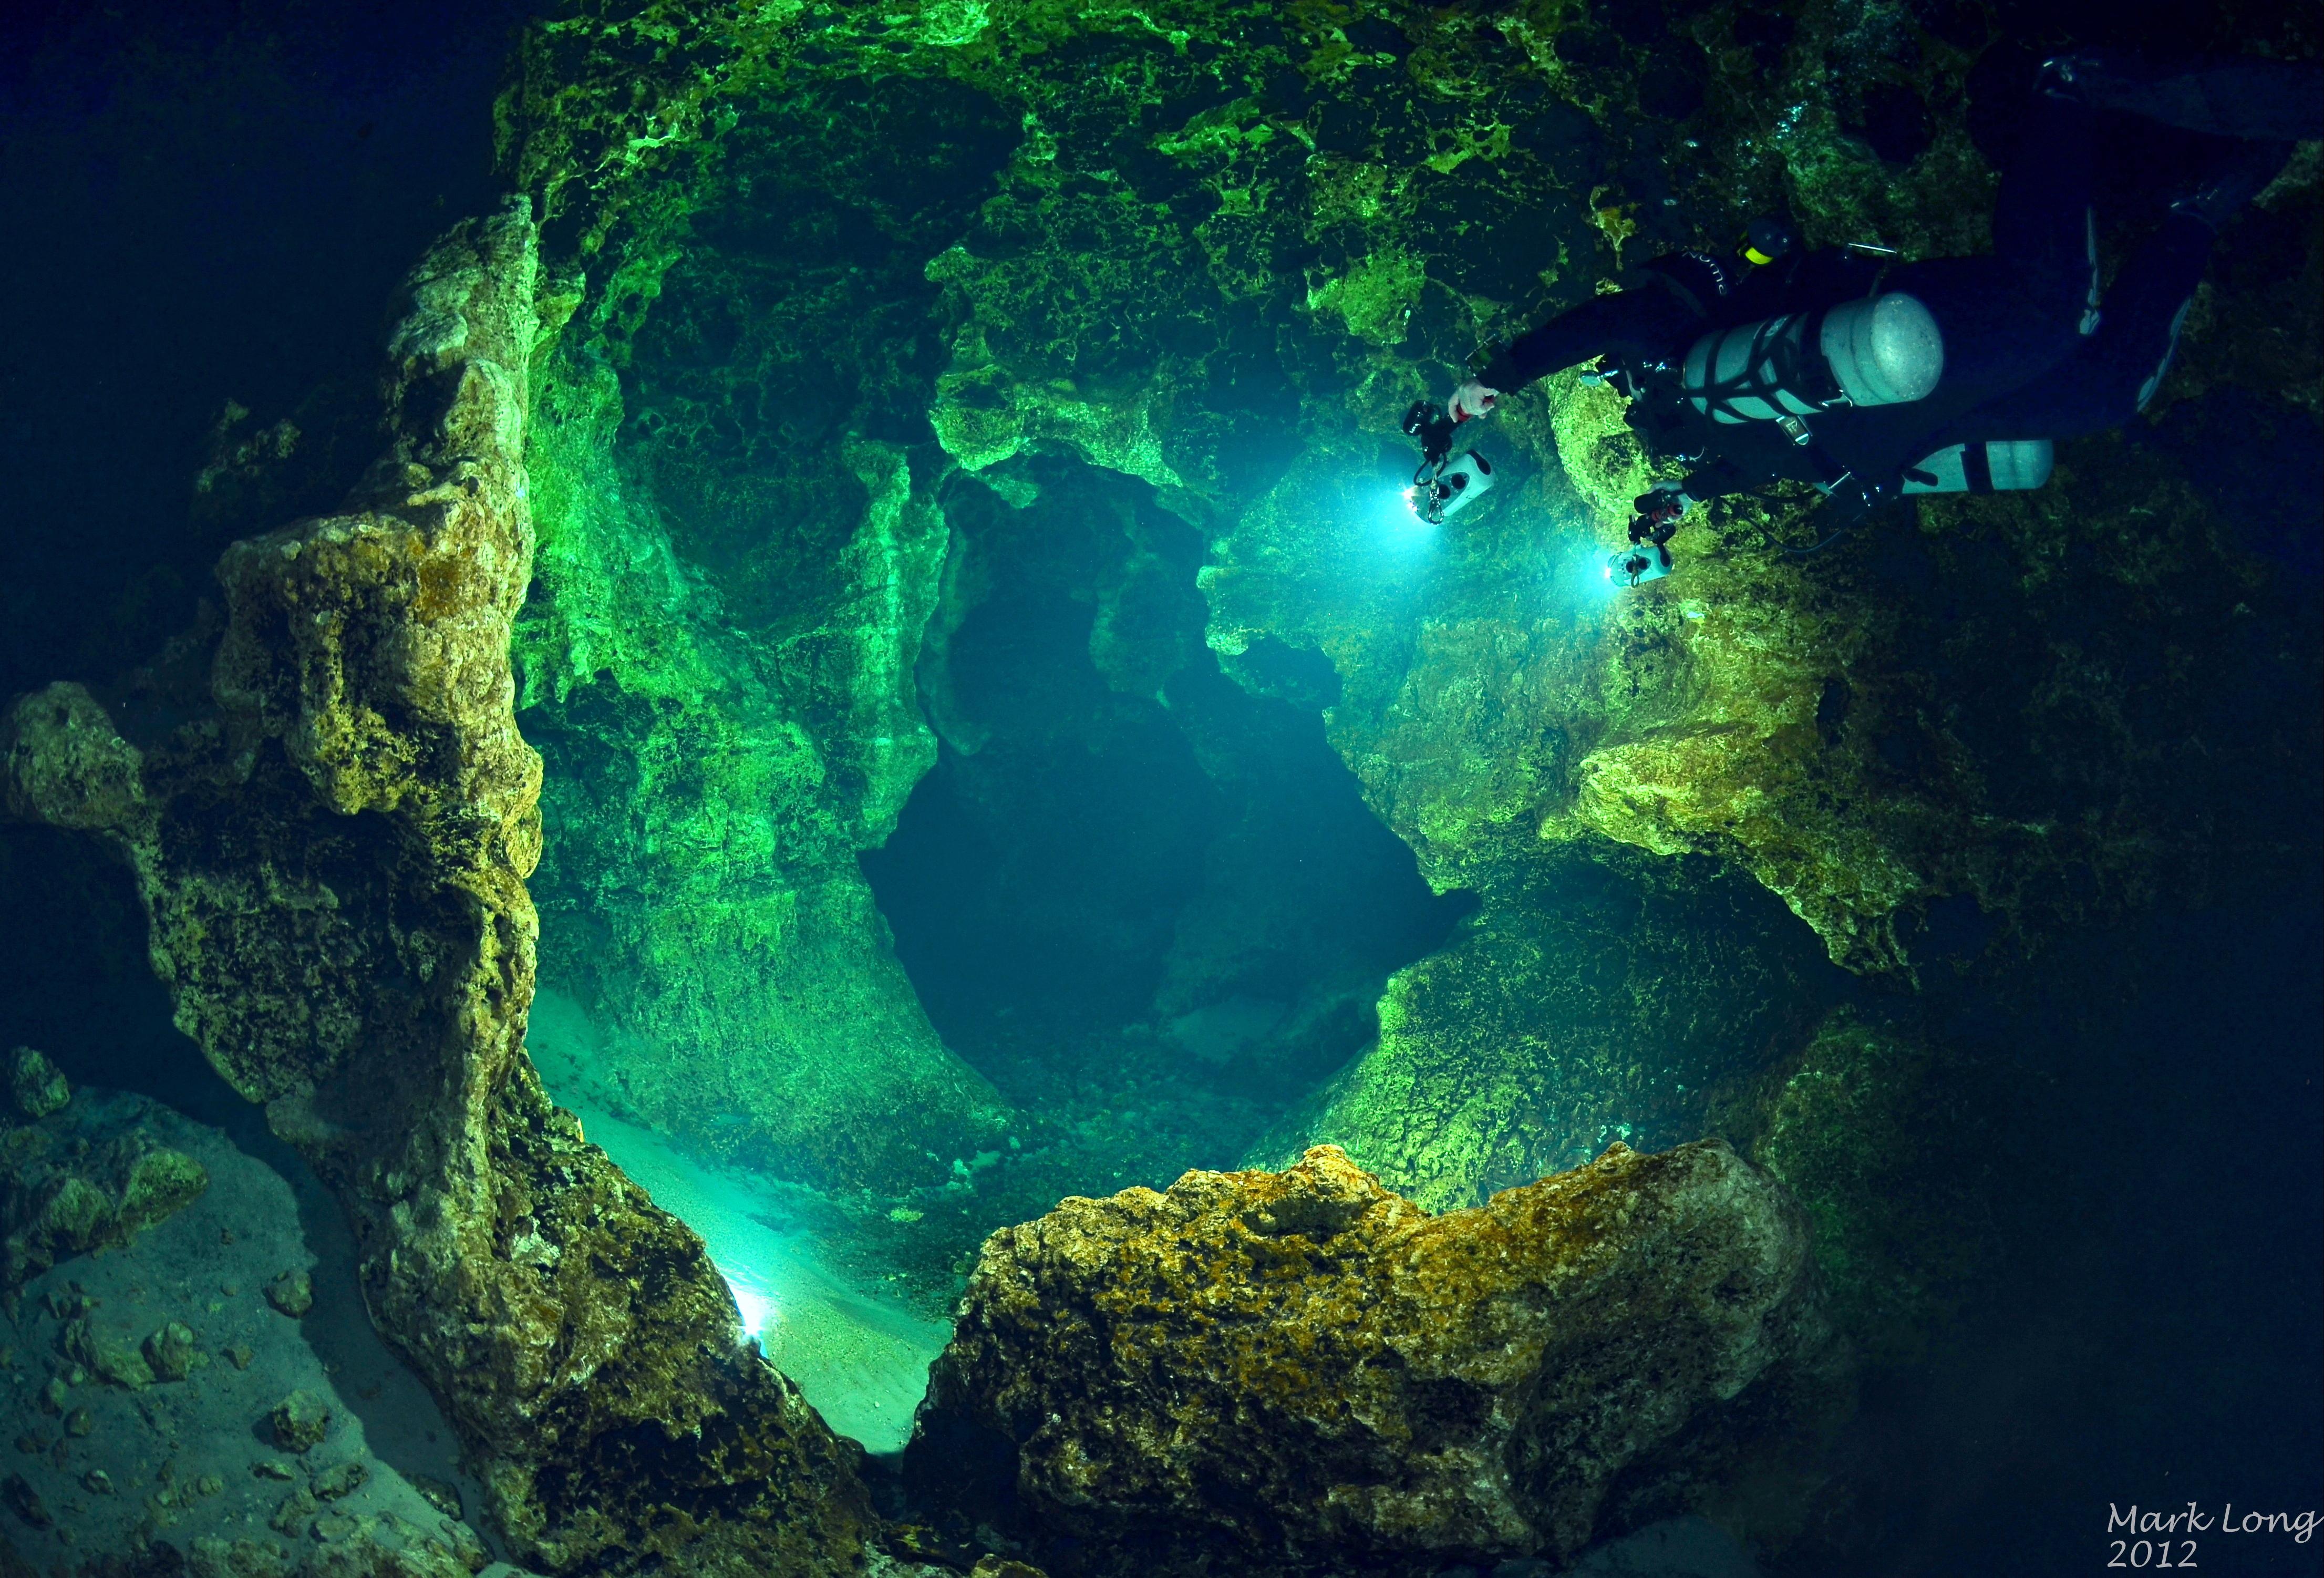 Devil's Spring System Scuba Diving